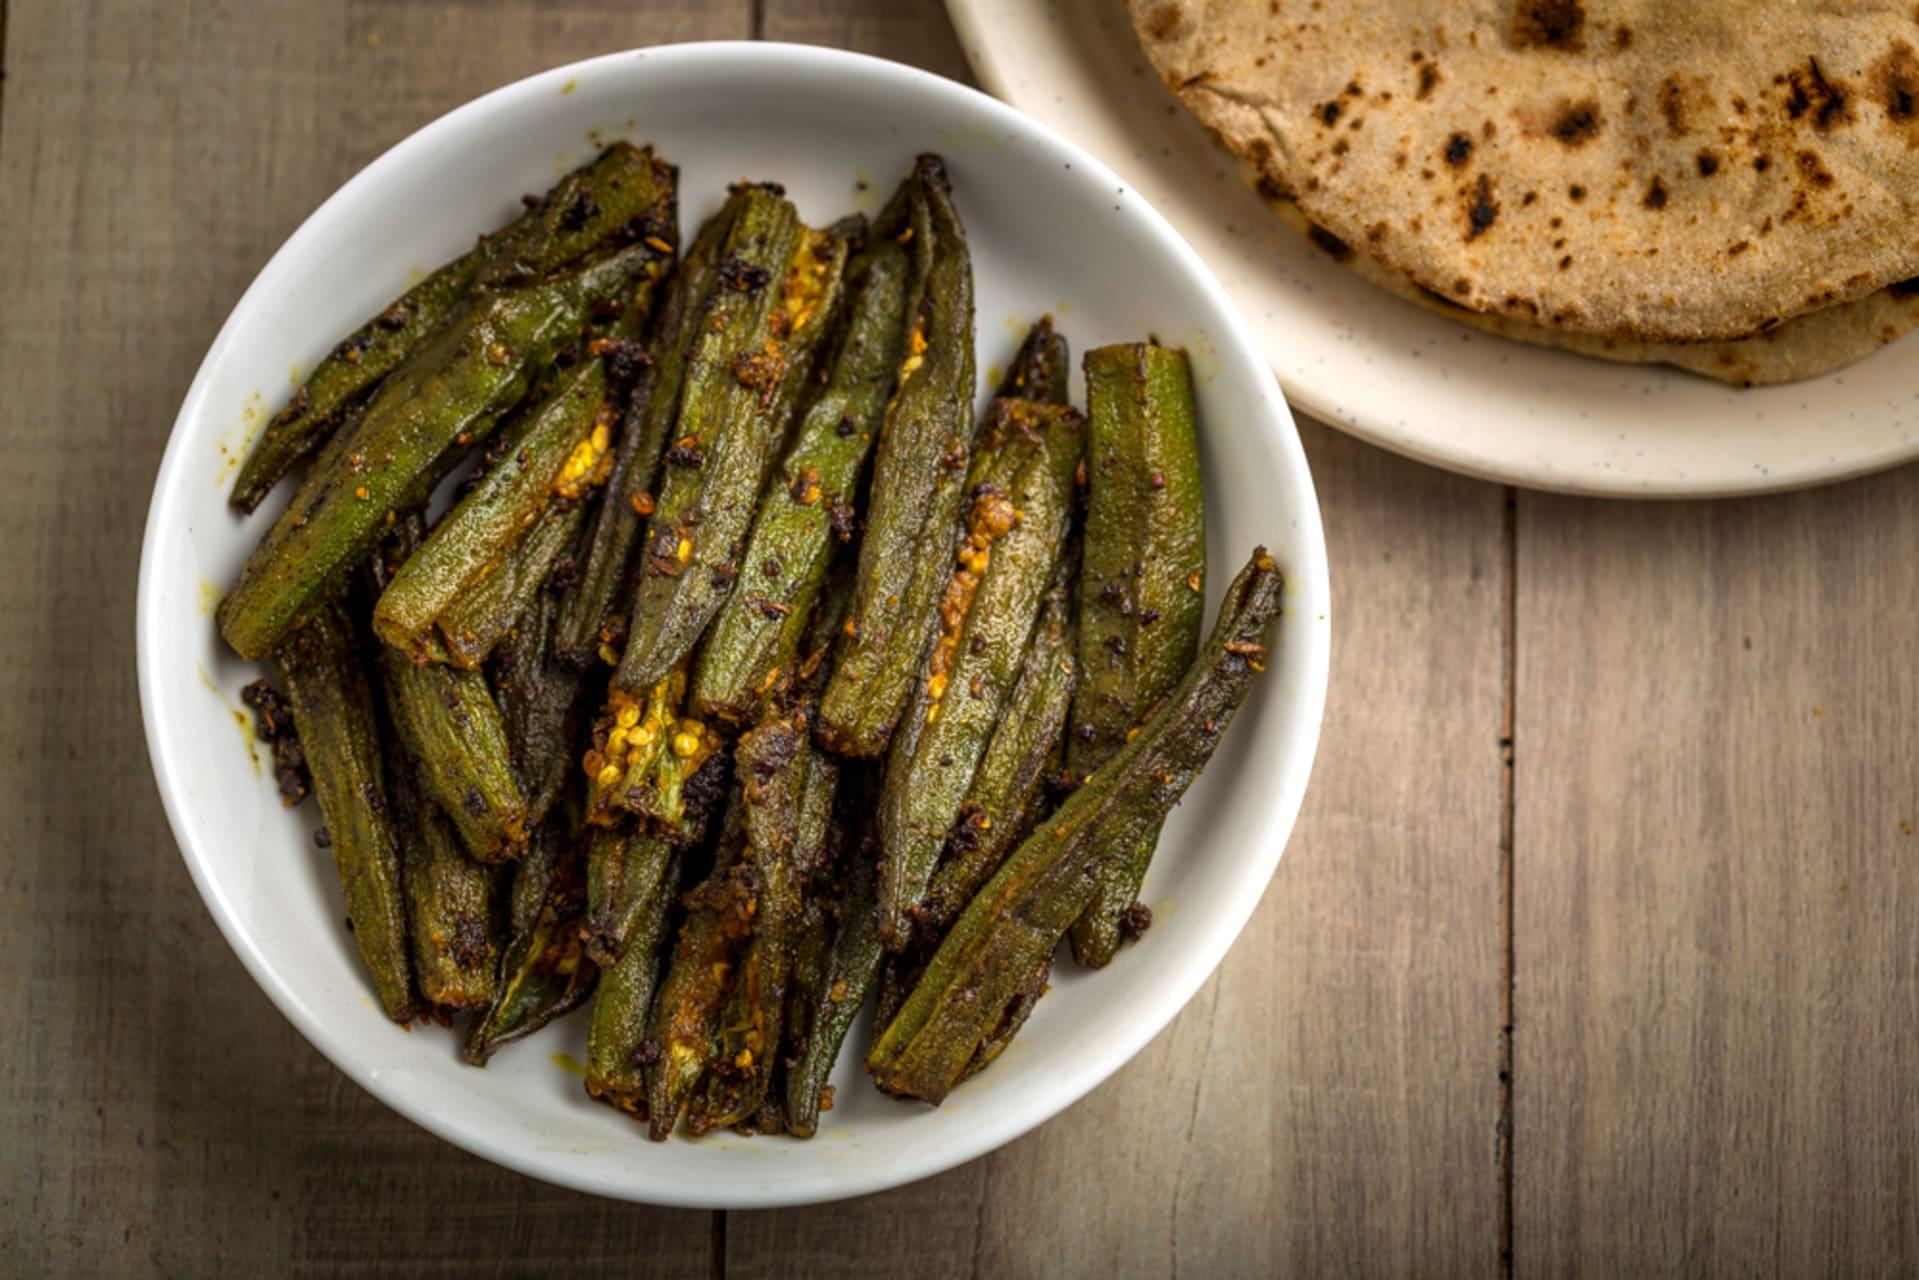 Delhi - Tempting Home Made Bhindi (Ocra) with Phulka Bread